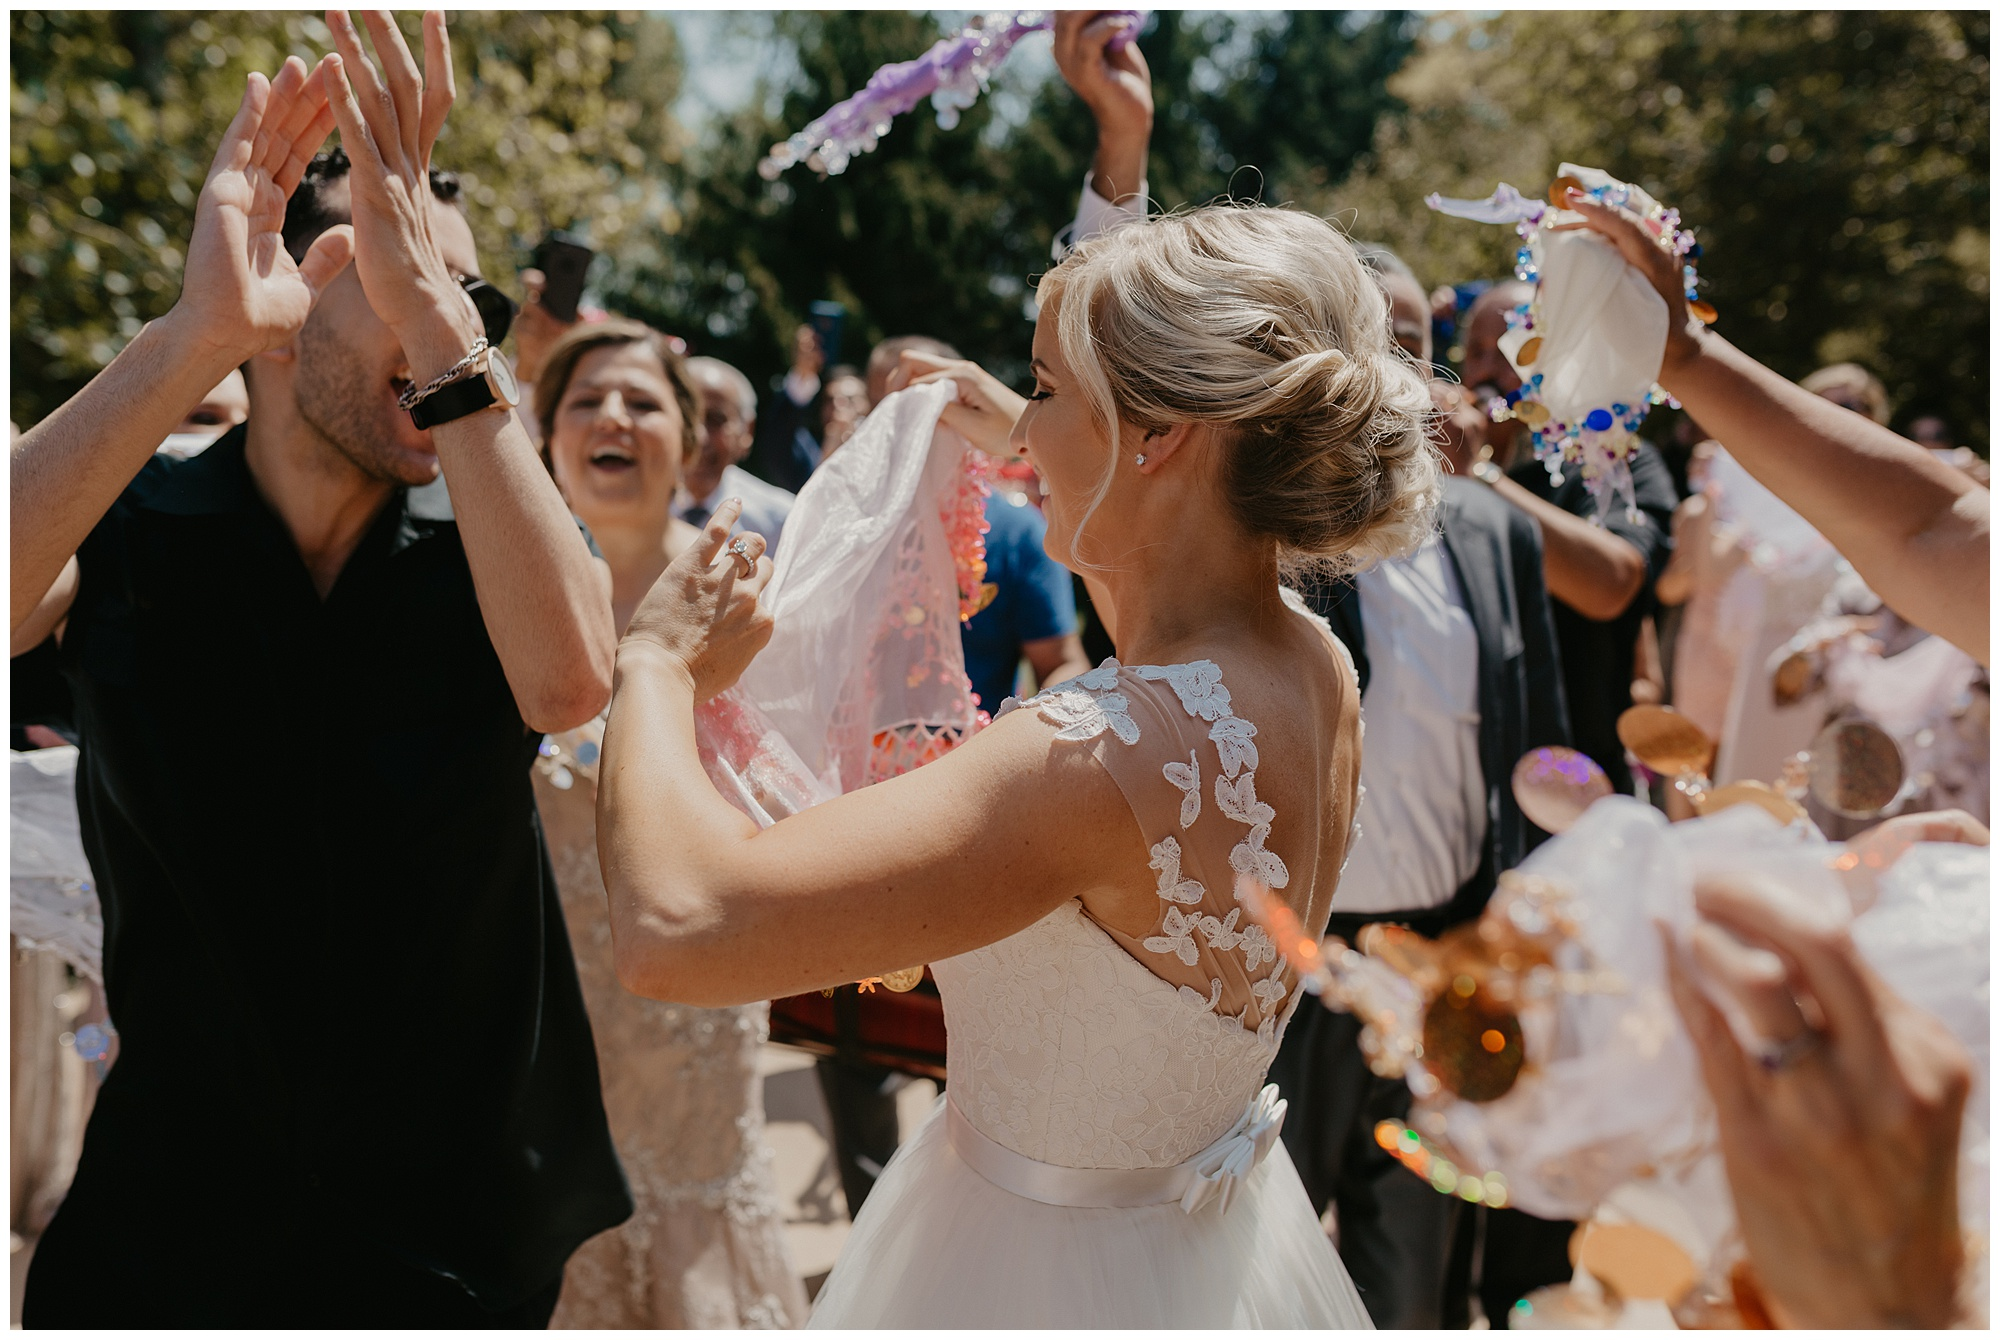 pear_tree_estate_wedding_champaign_il_wright_photographs_jj_0080.jpg